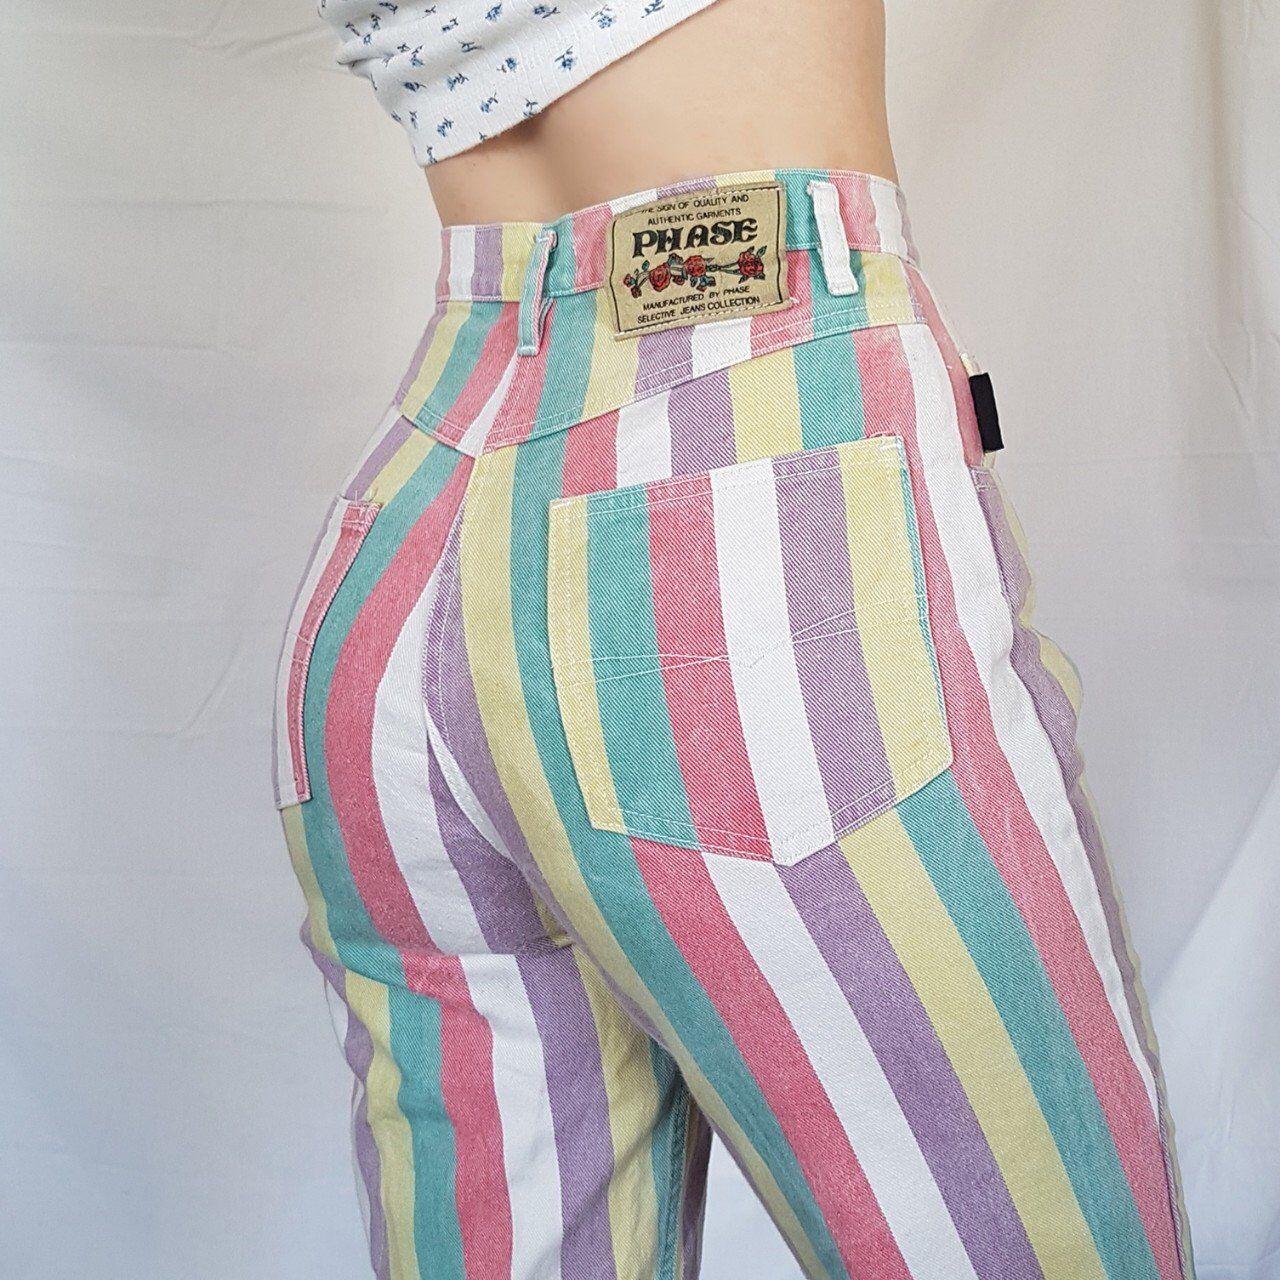 e0d3668dc Listed on Depop by denisesarahxo in 2019   depop   Colored jeans ...